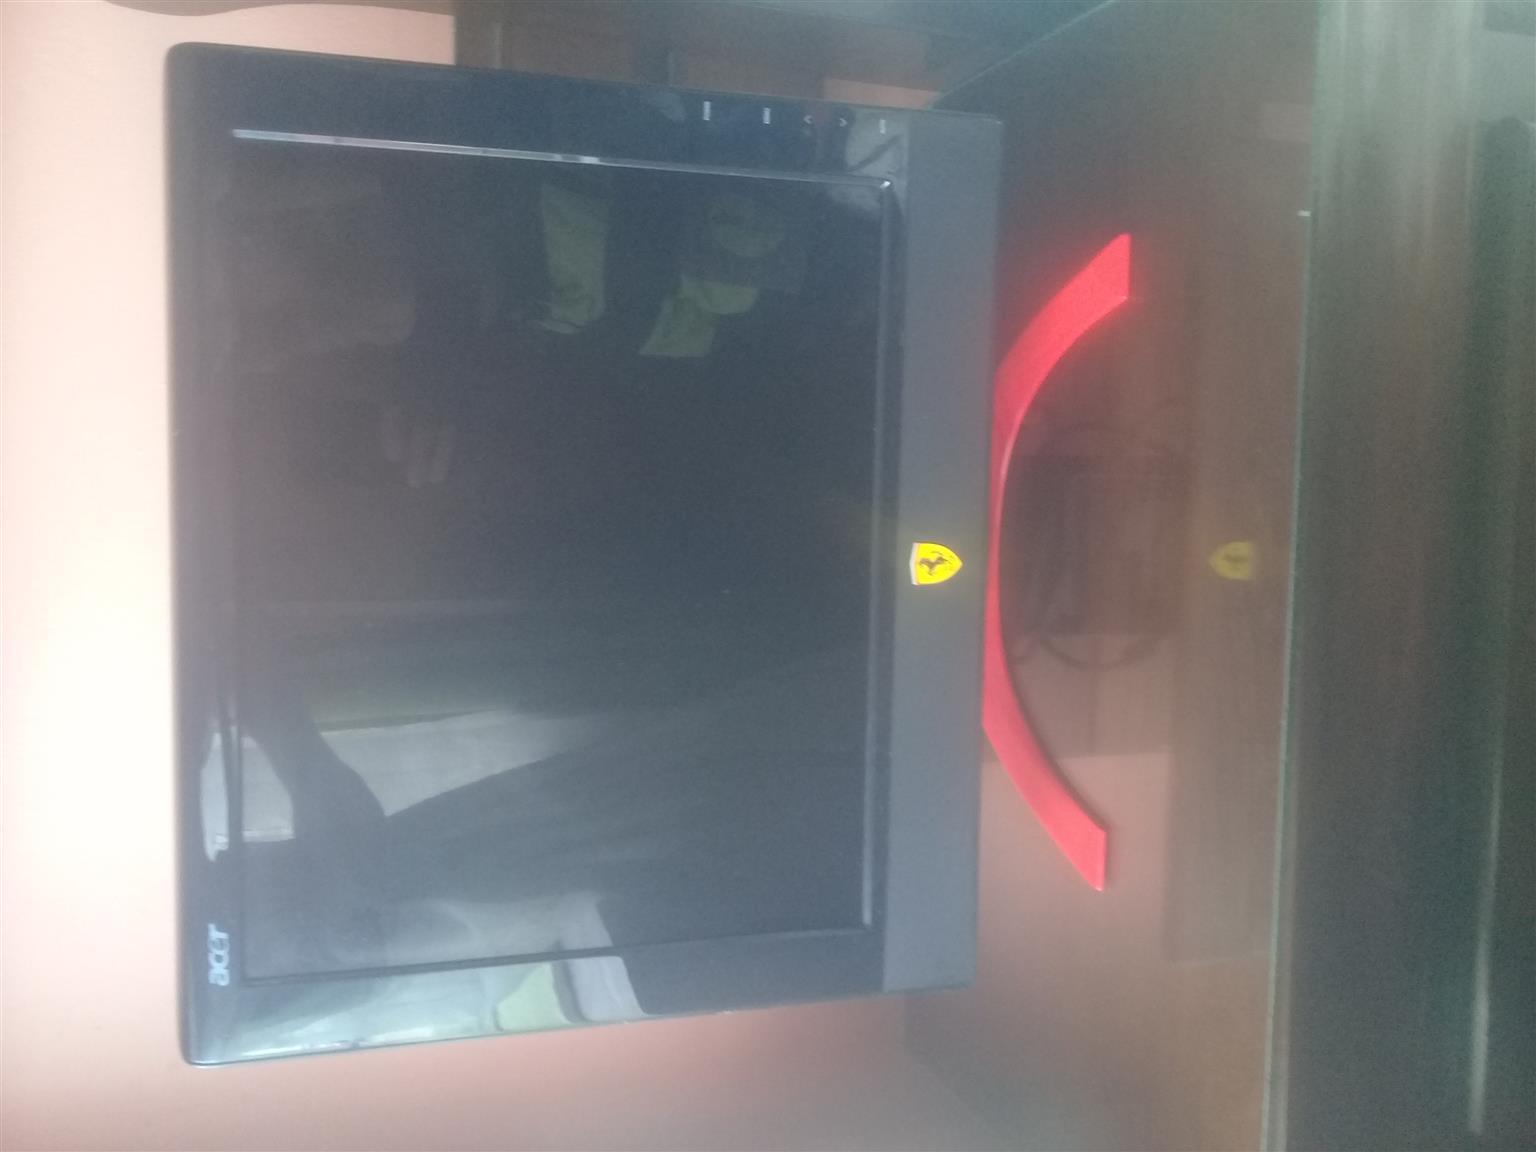 Ferrari PC monitor